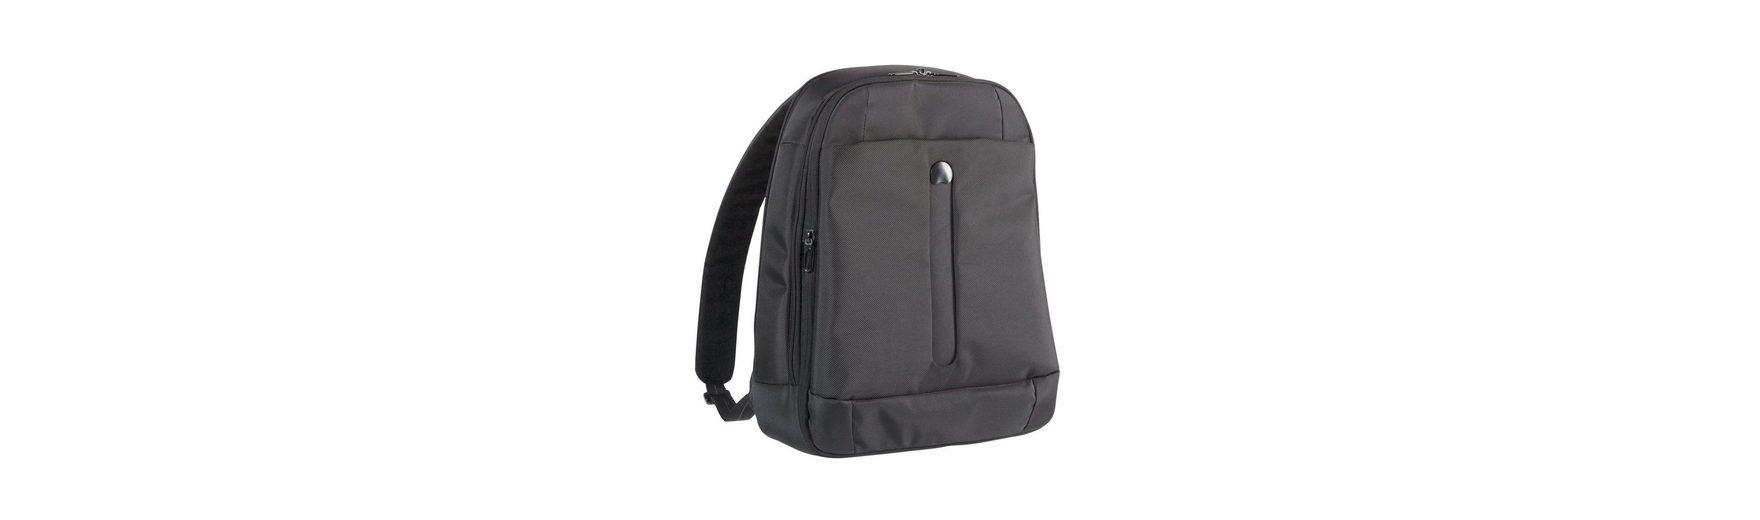 DELSEY Rucksack mit gepolstertem 15,6-Zoll Laptopfach, »Bellecour«